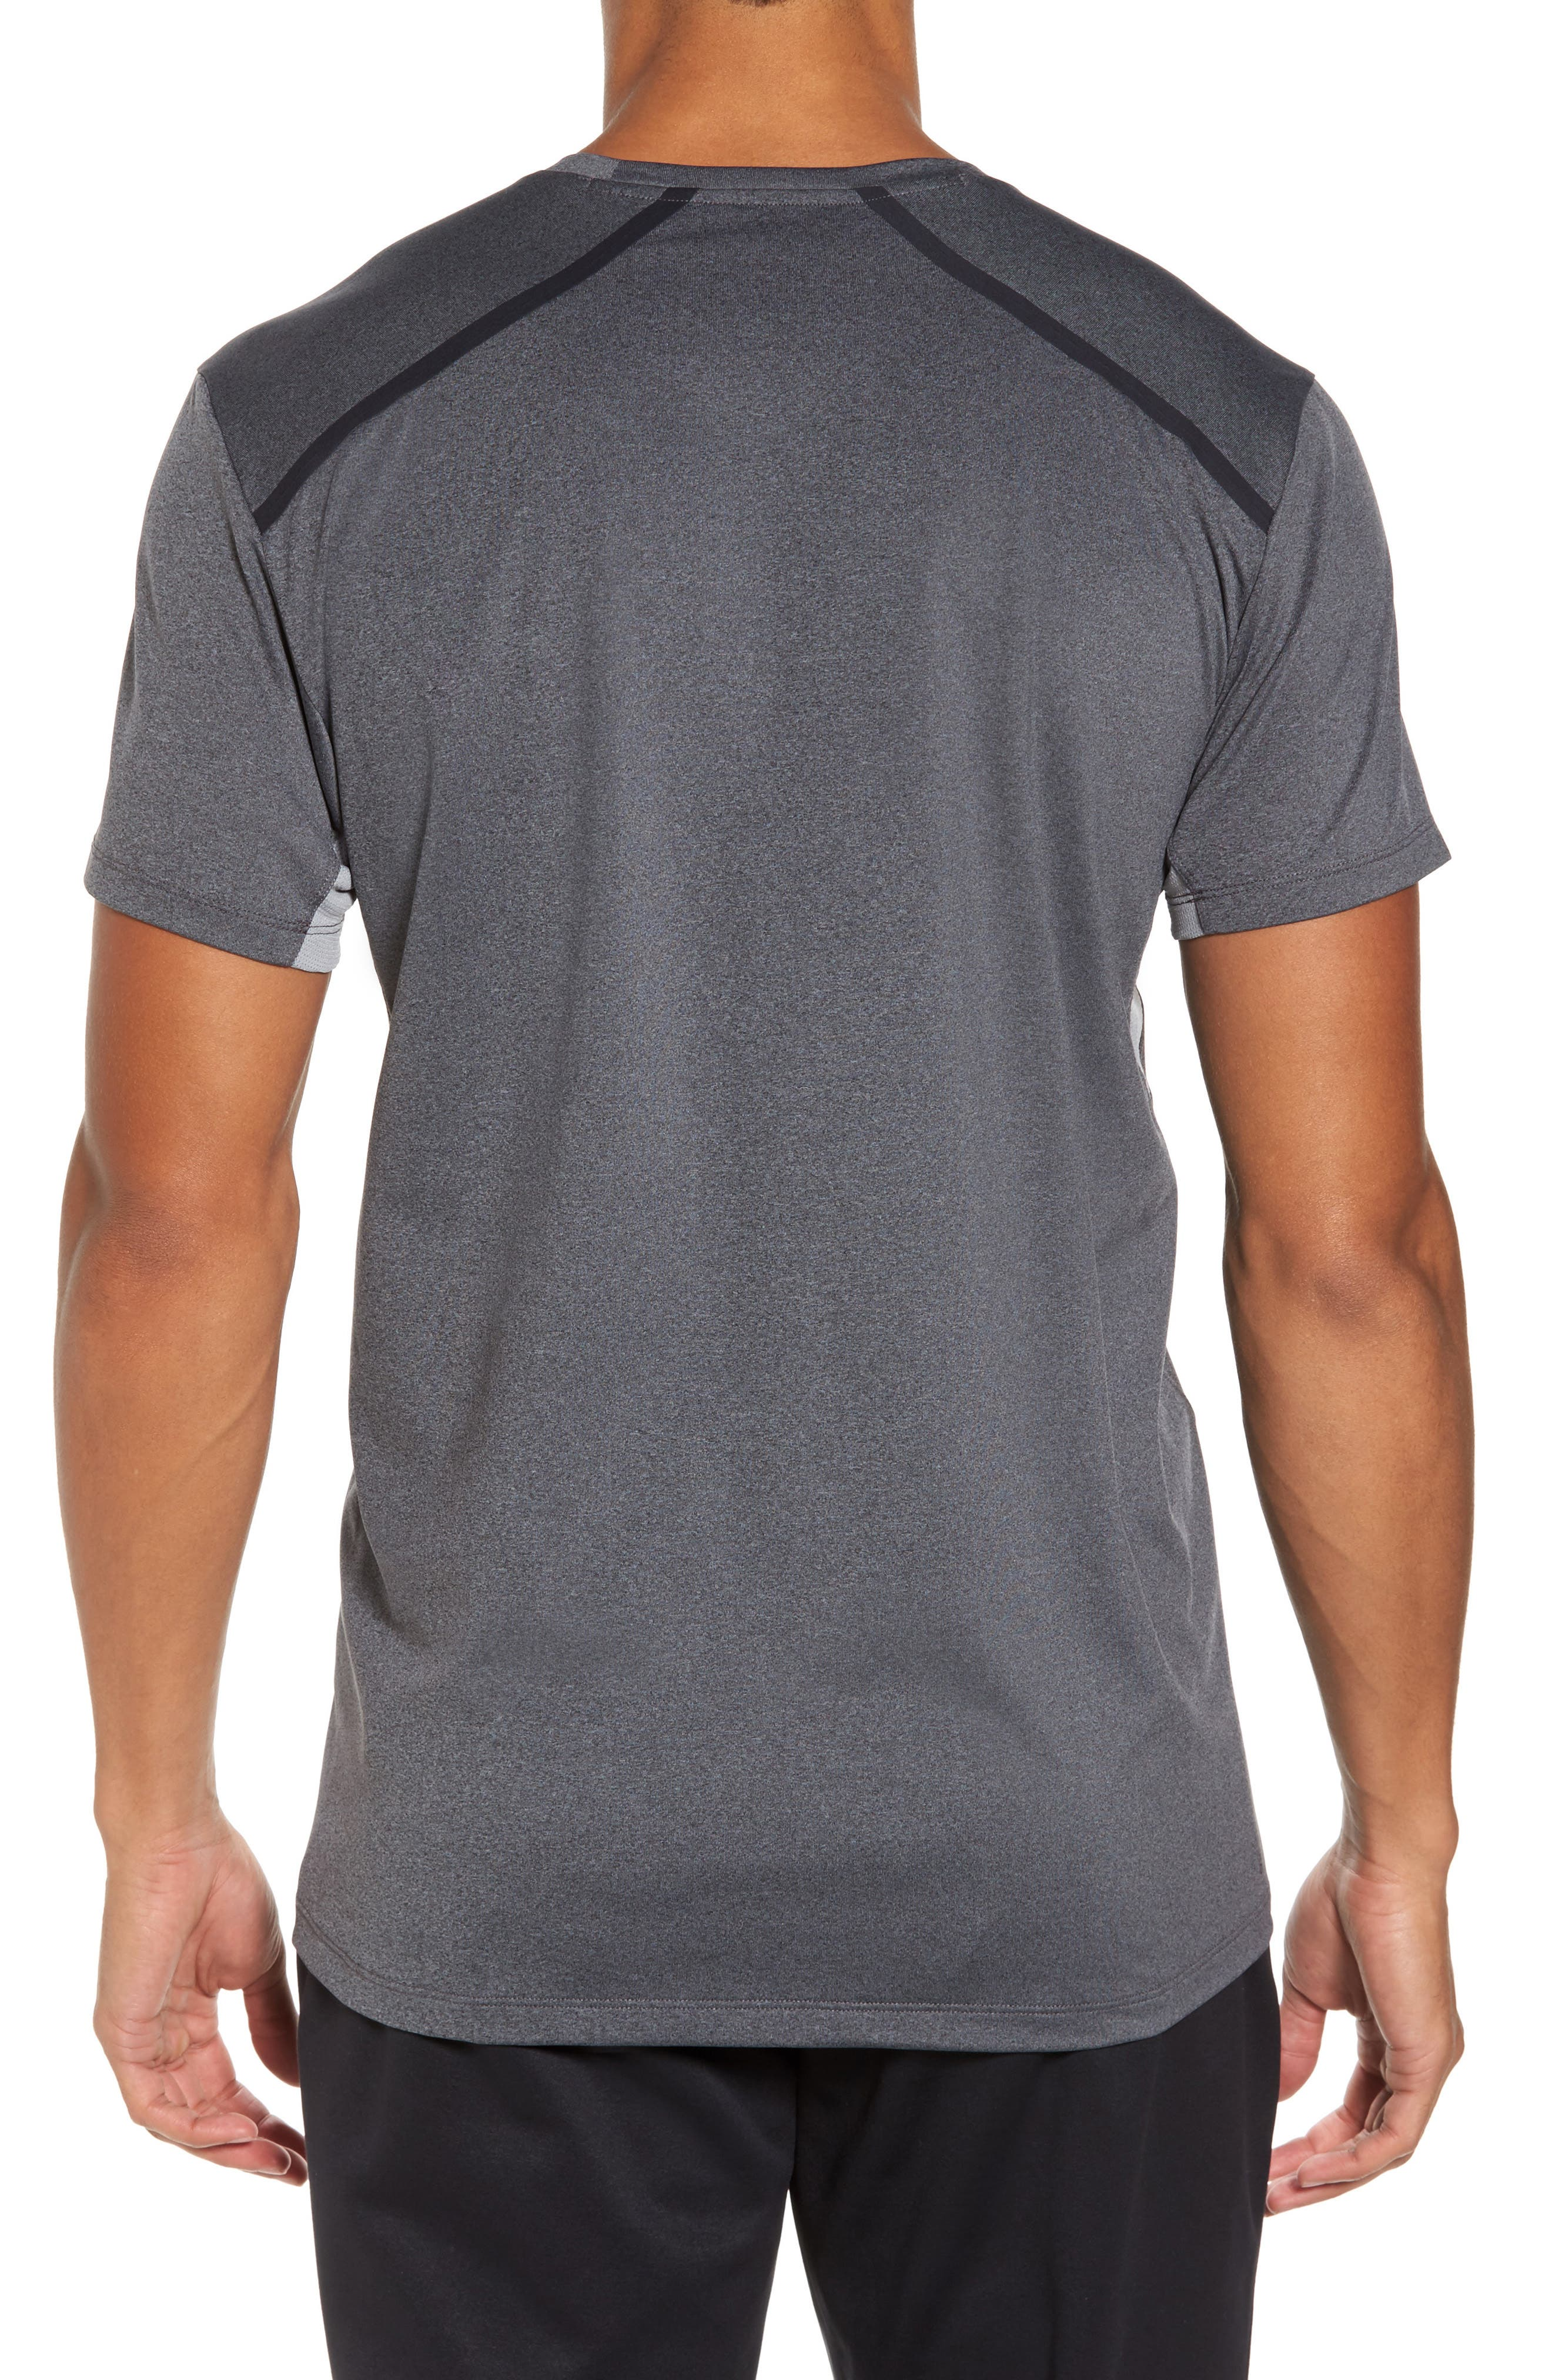 Alternate Image 2  - The North Face 'Kilowatt' Performance T-Shirt